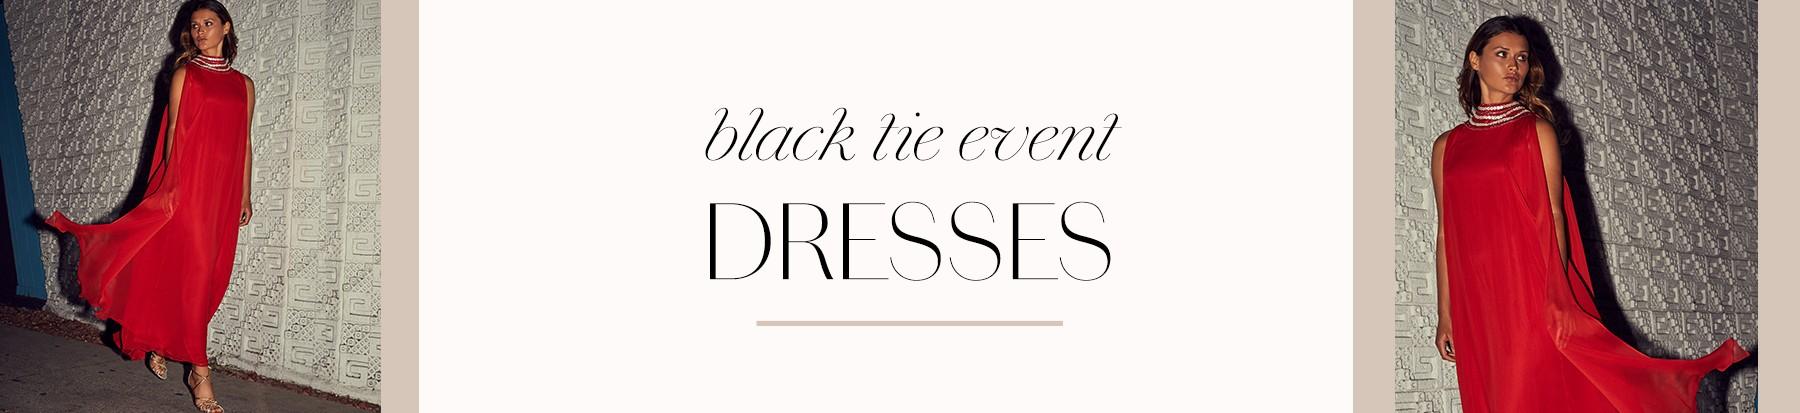 Black Tie Event - Dresses